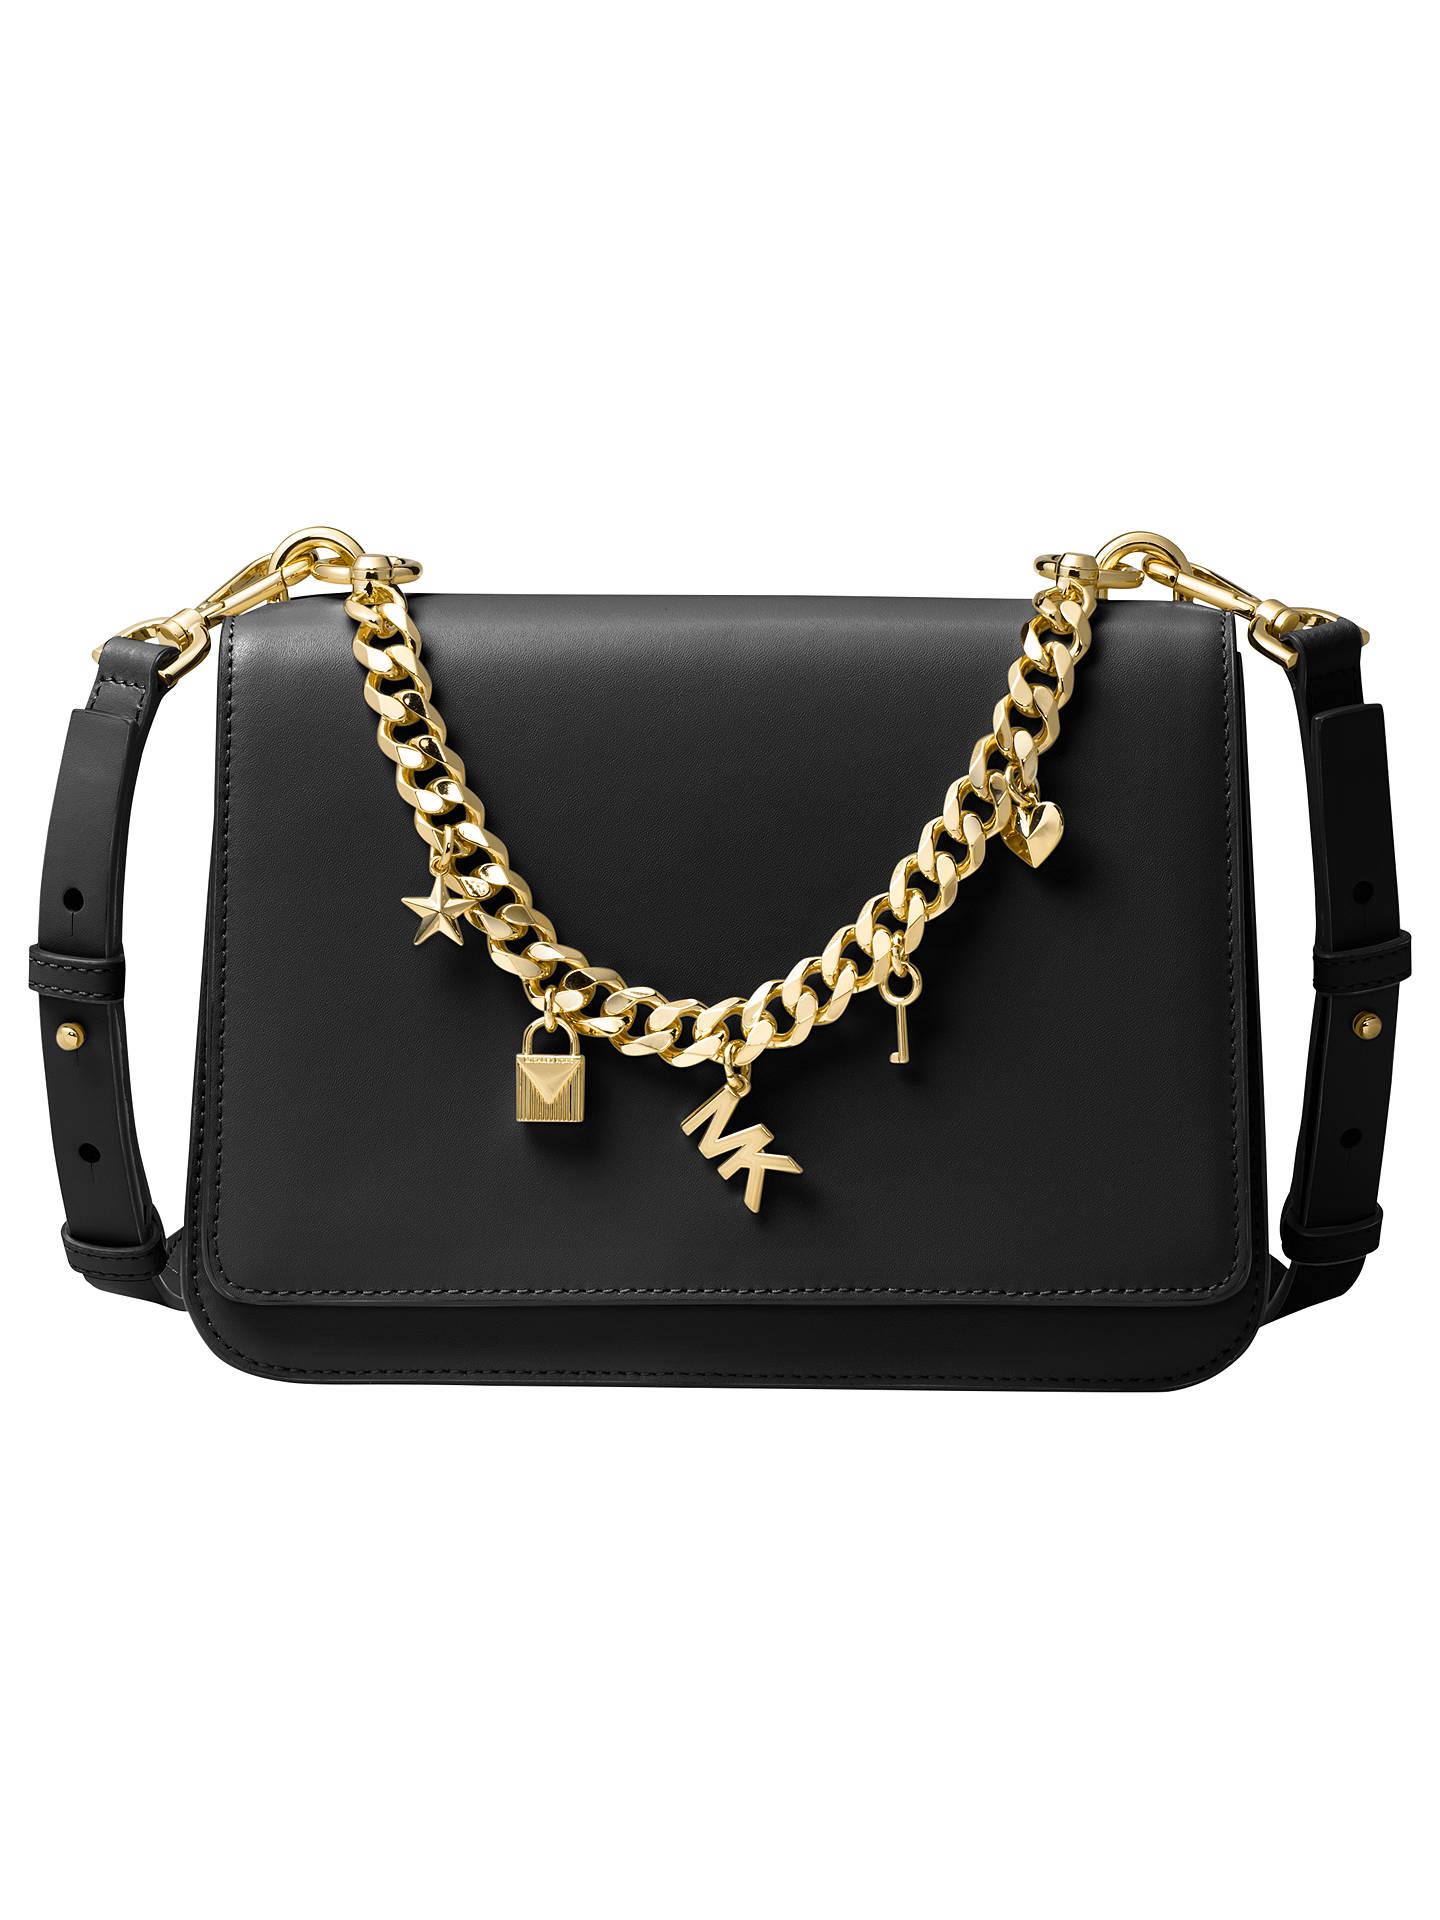 1fb3b7c3234 MICHAEL Michael Kors Mott Leather Large Charm Swag Bag at John Lewis ...